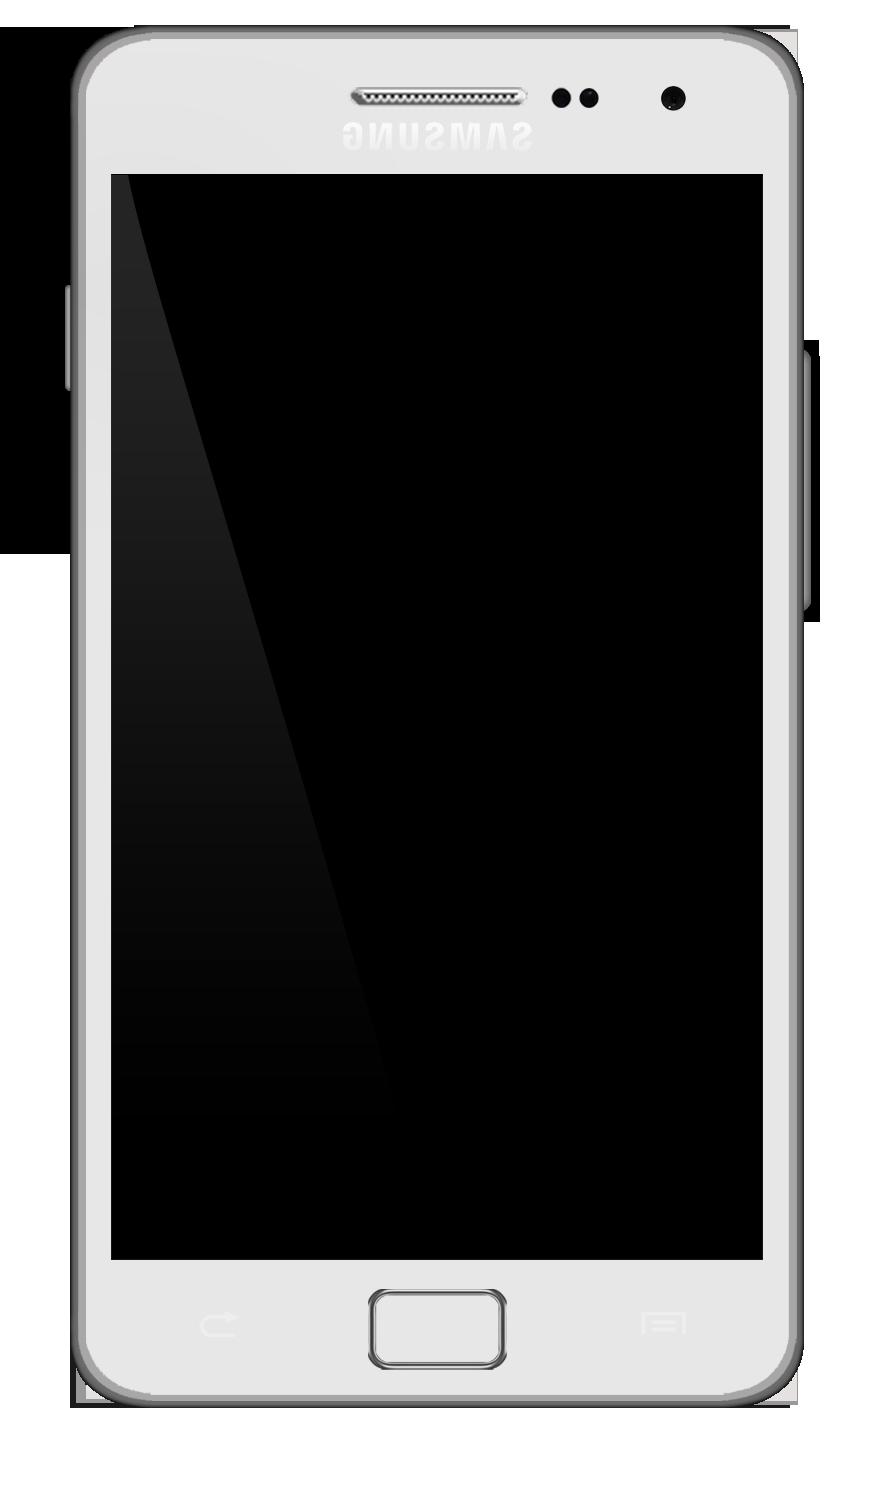 Ver sofá Nkde Samsung Galaxy S Ii Wikipedia